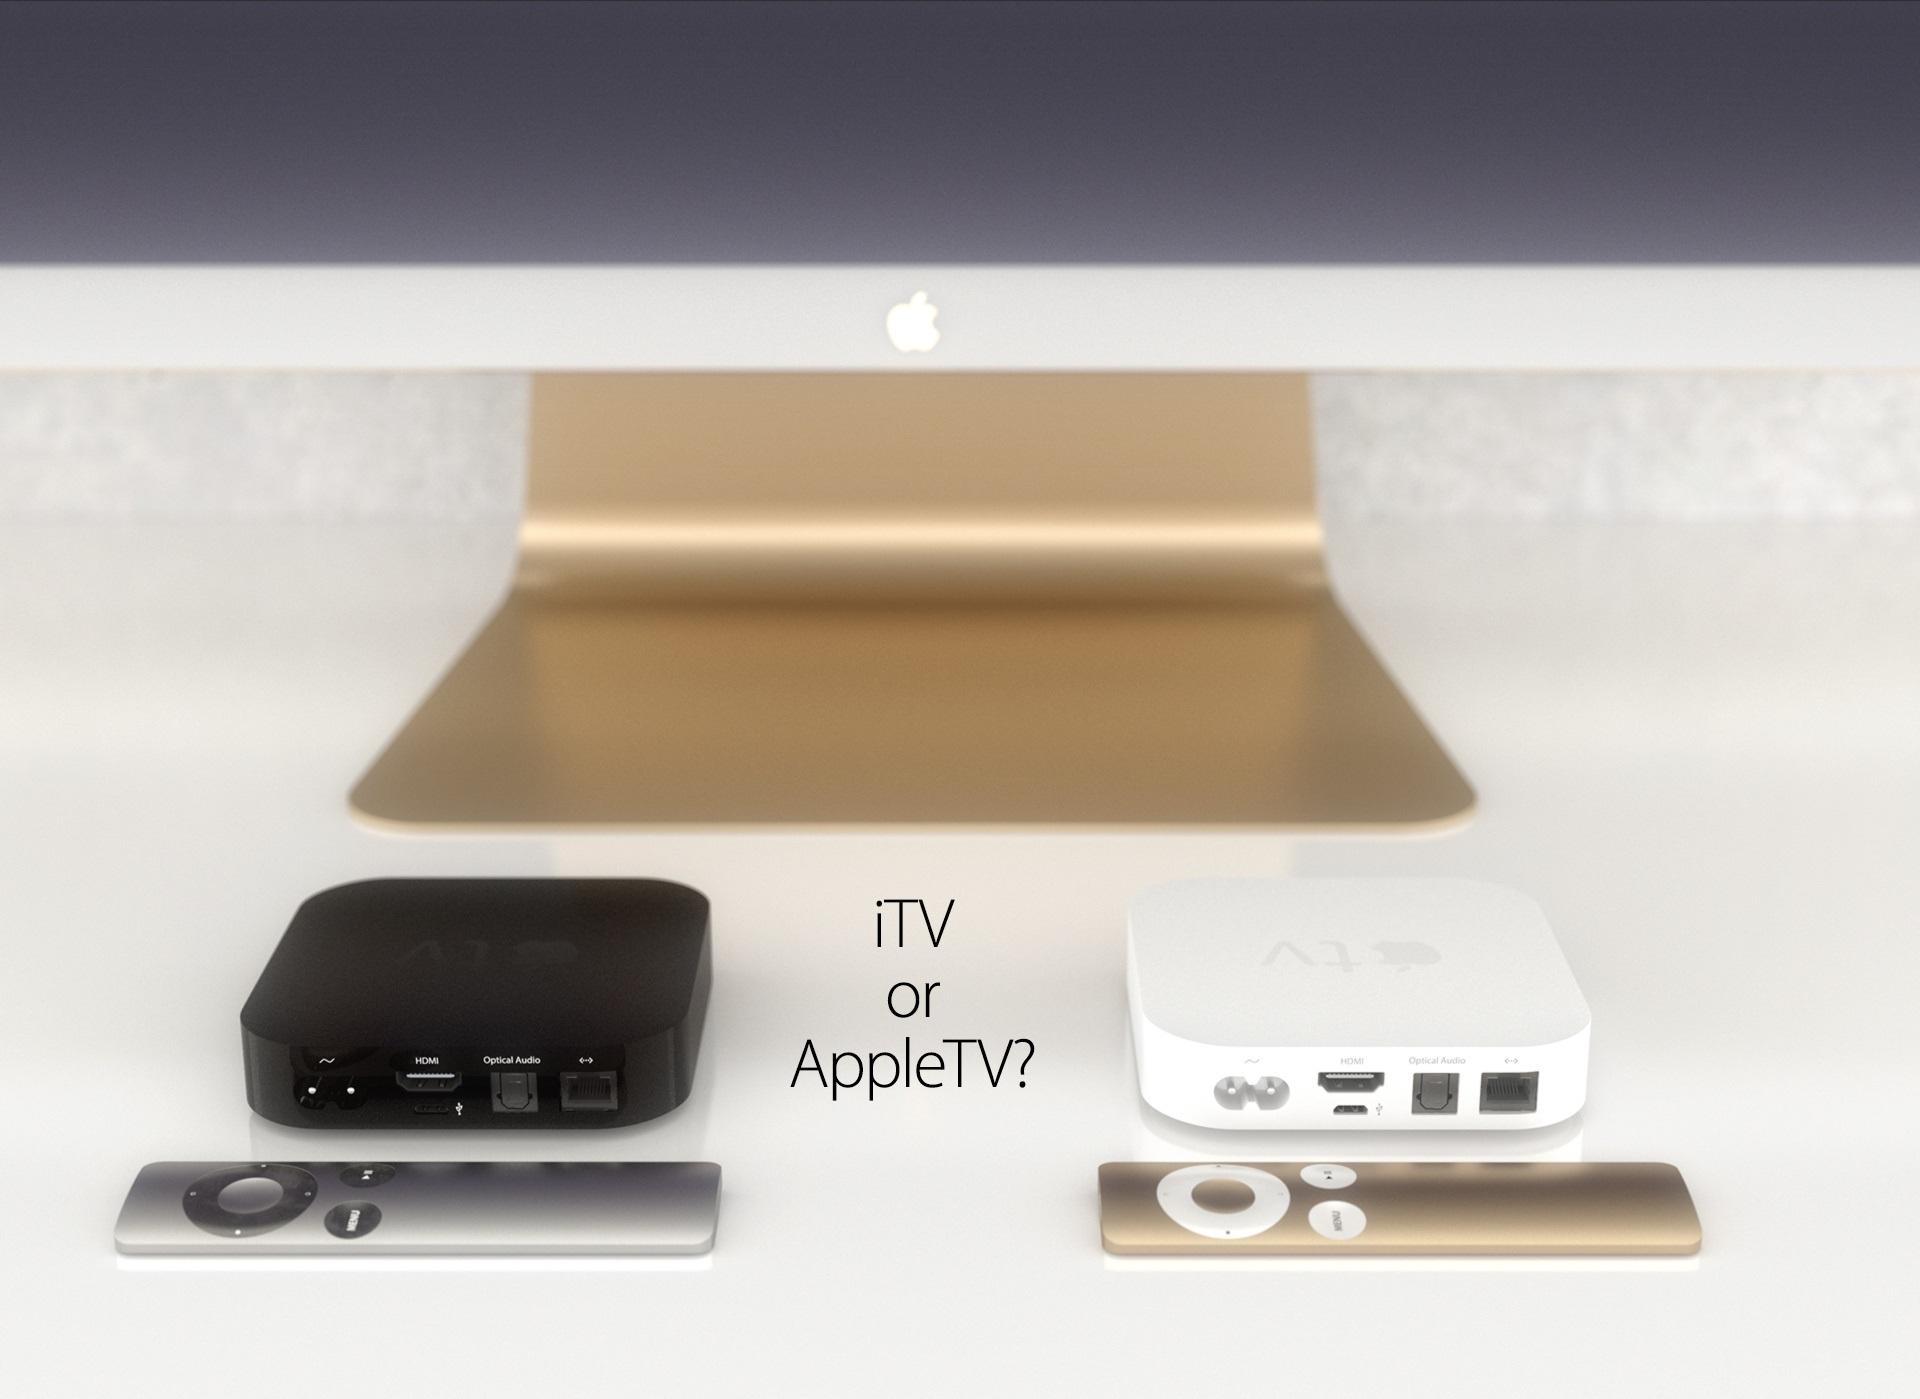 iTV-concept-iTV-or-Apple-TV-Martin-Hajek-001